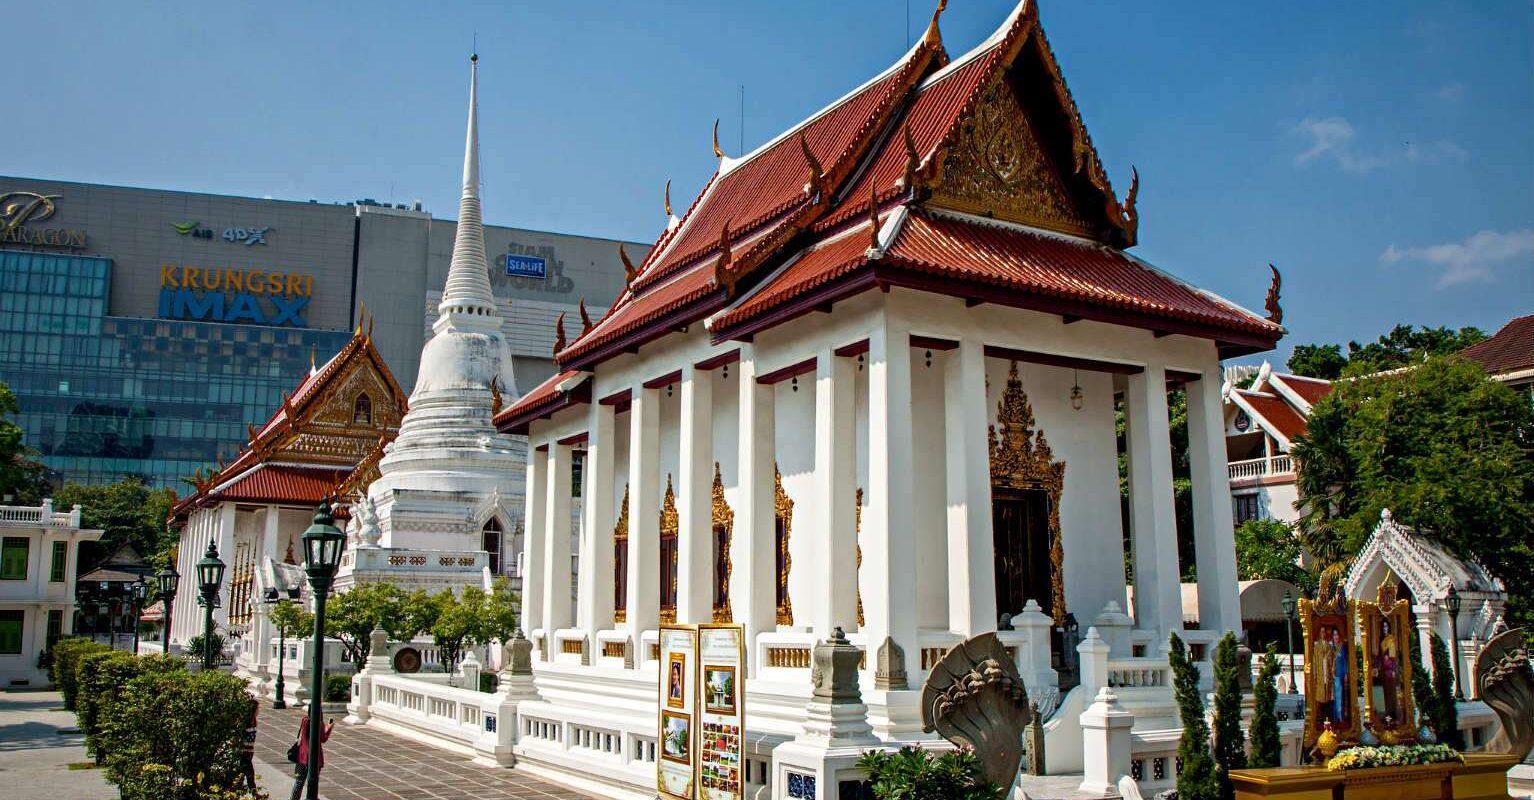 Siam Square, centrum Bangkok, Pathum Wanaram Temple